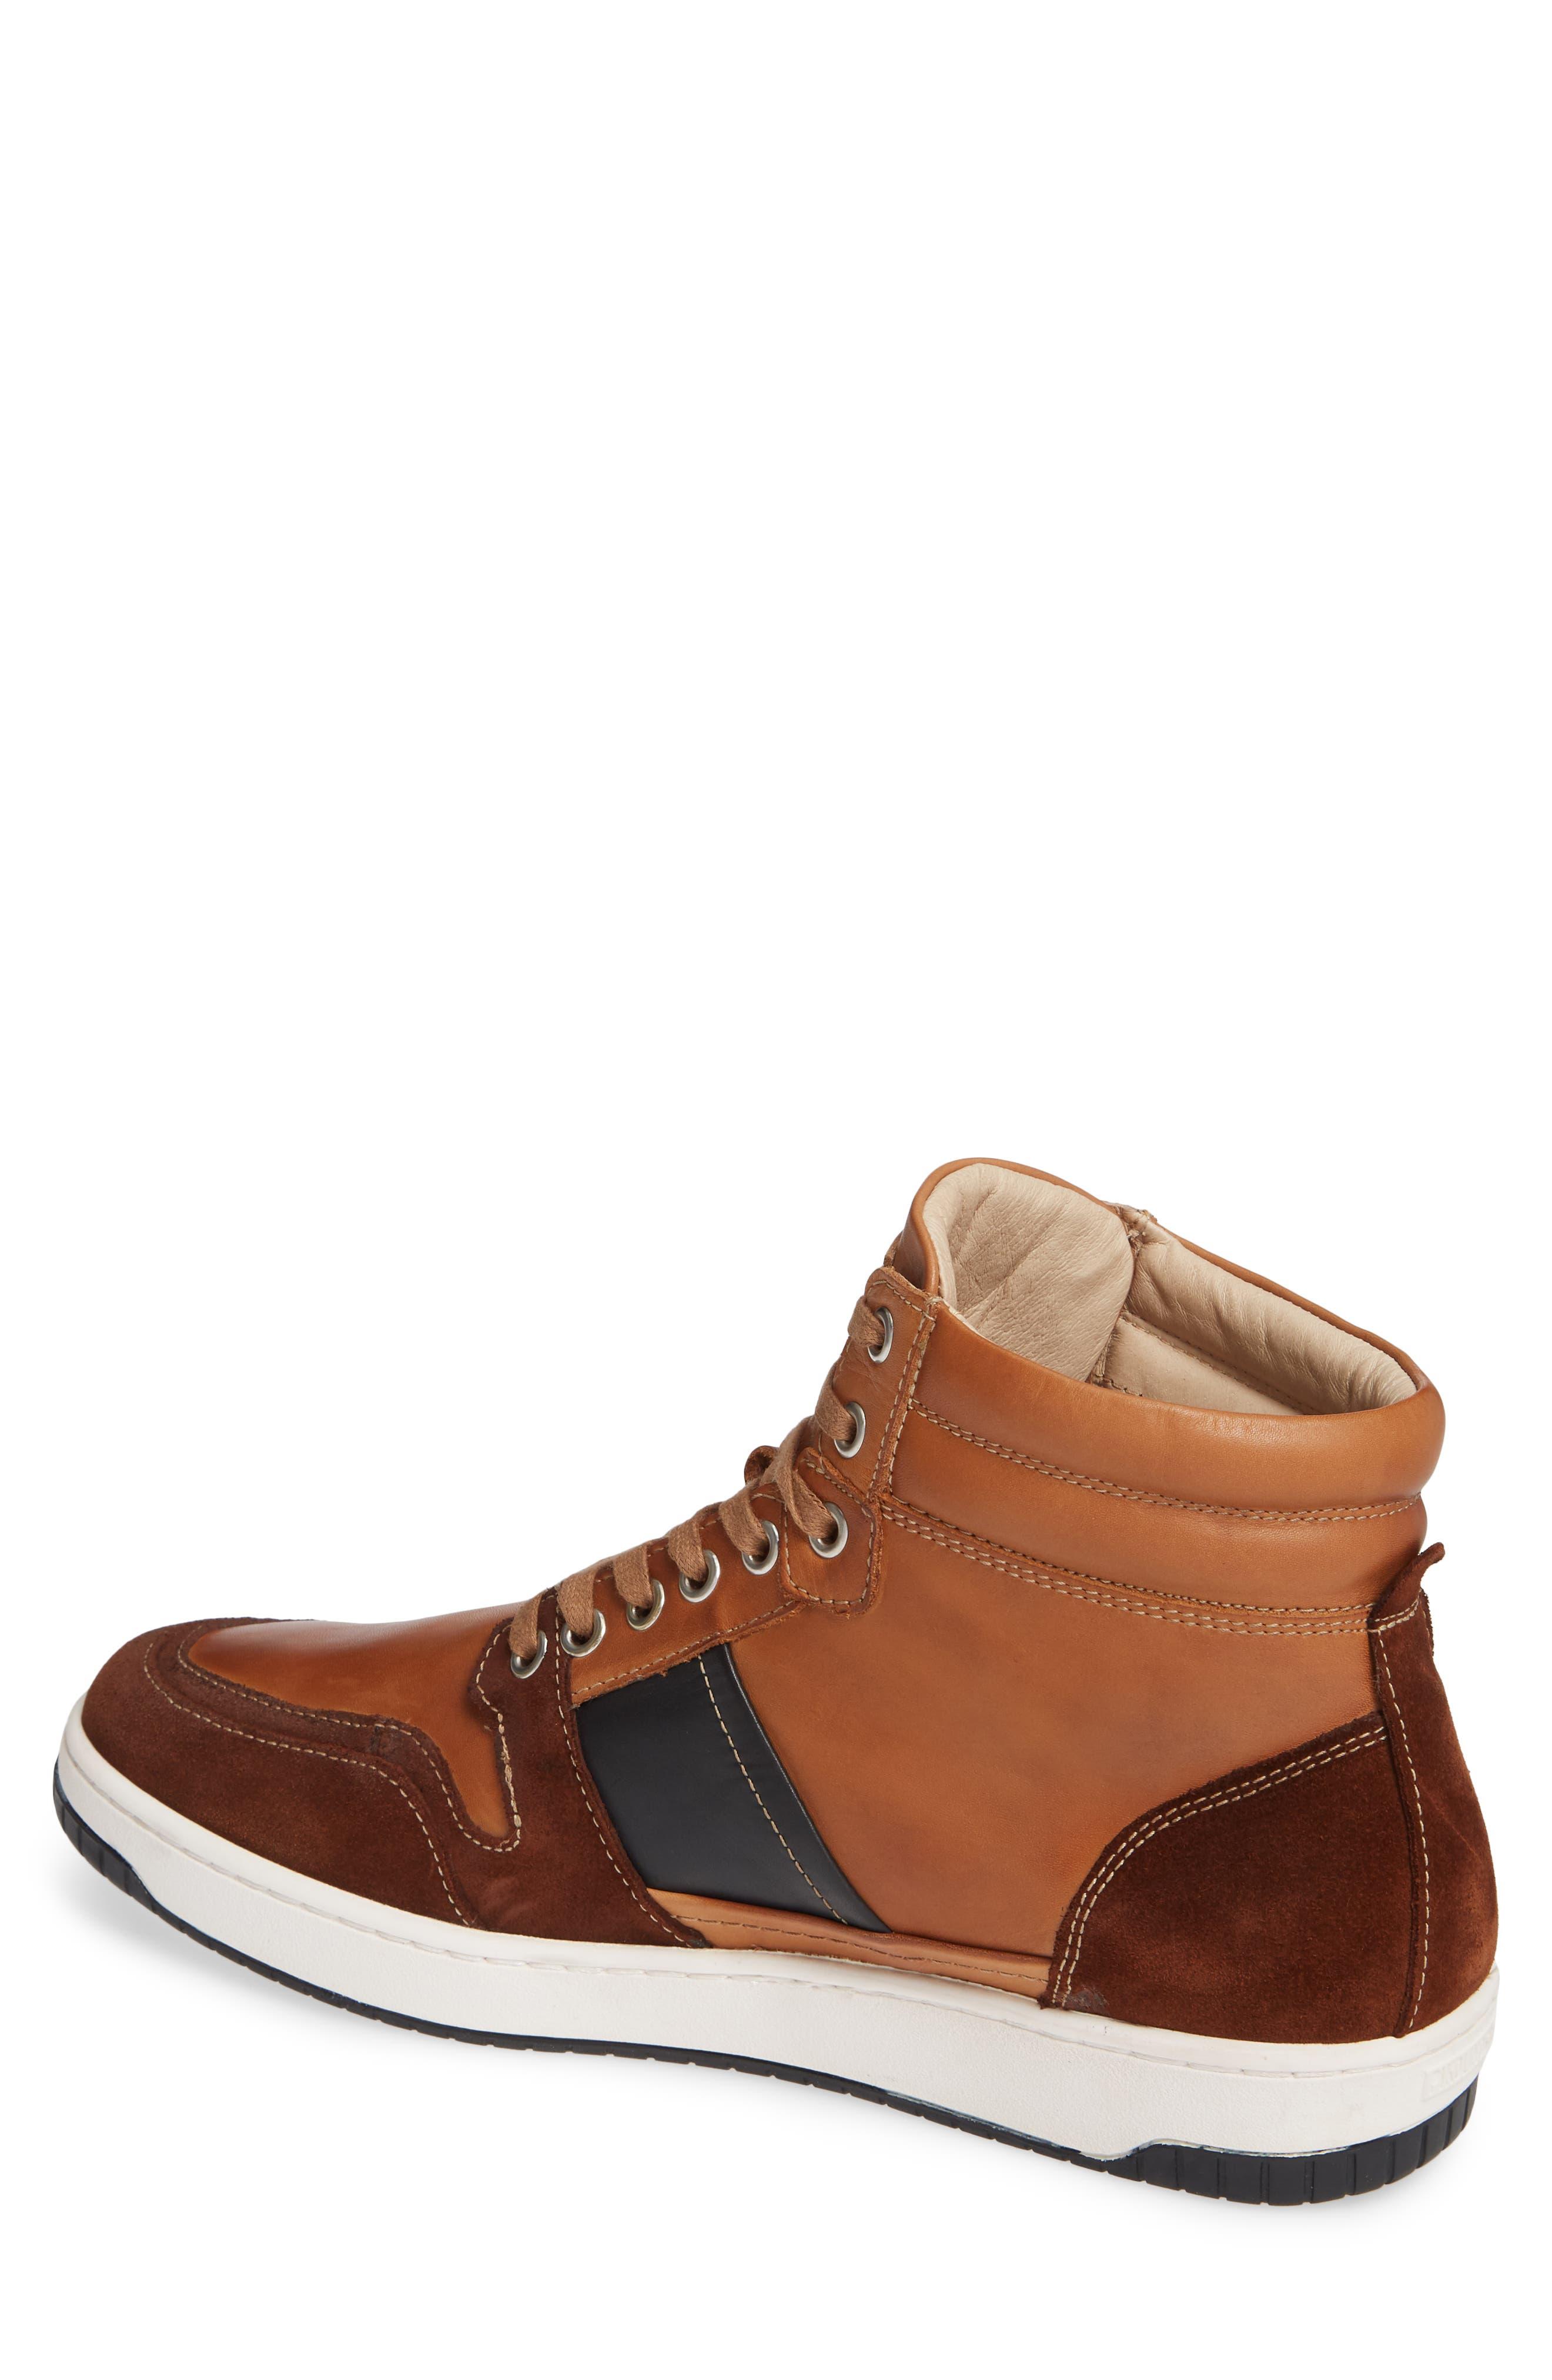 Corinto Sneaker,                             Alternate thumbnail 2, color,                             BRANDY BLACK